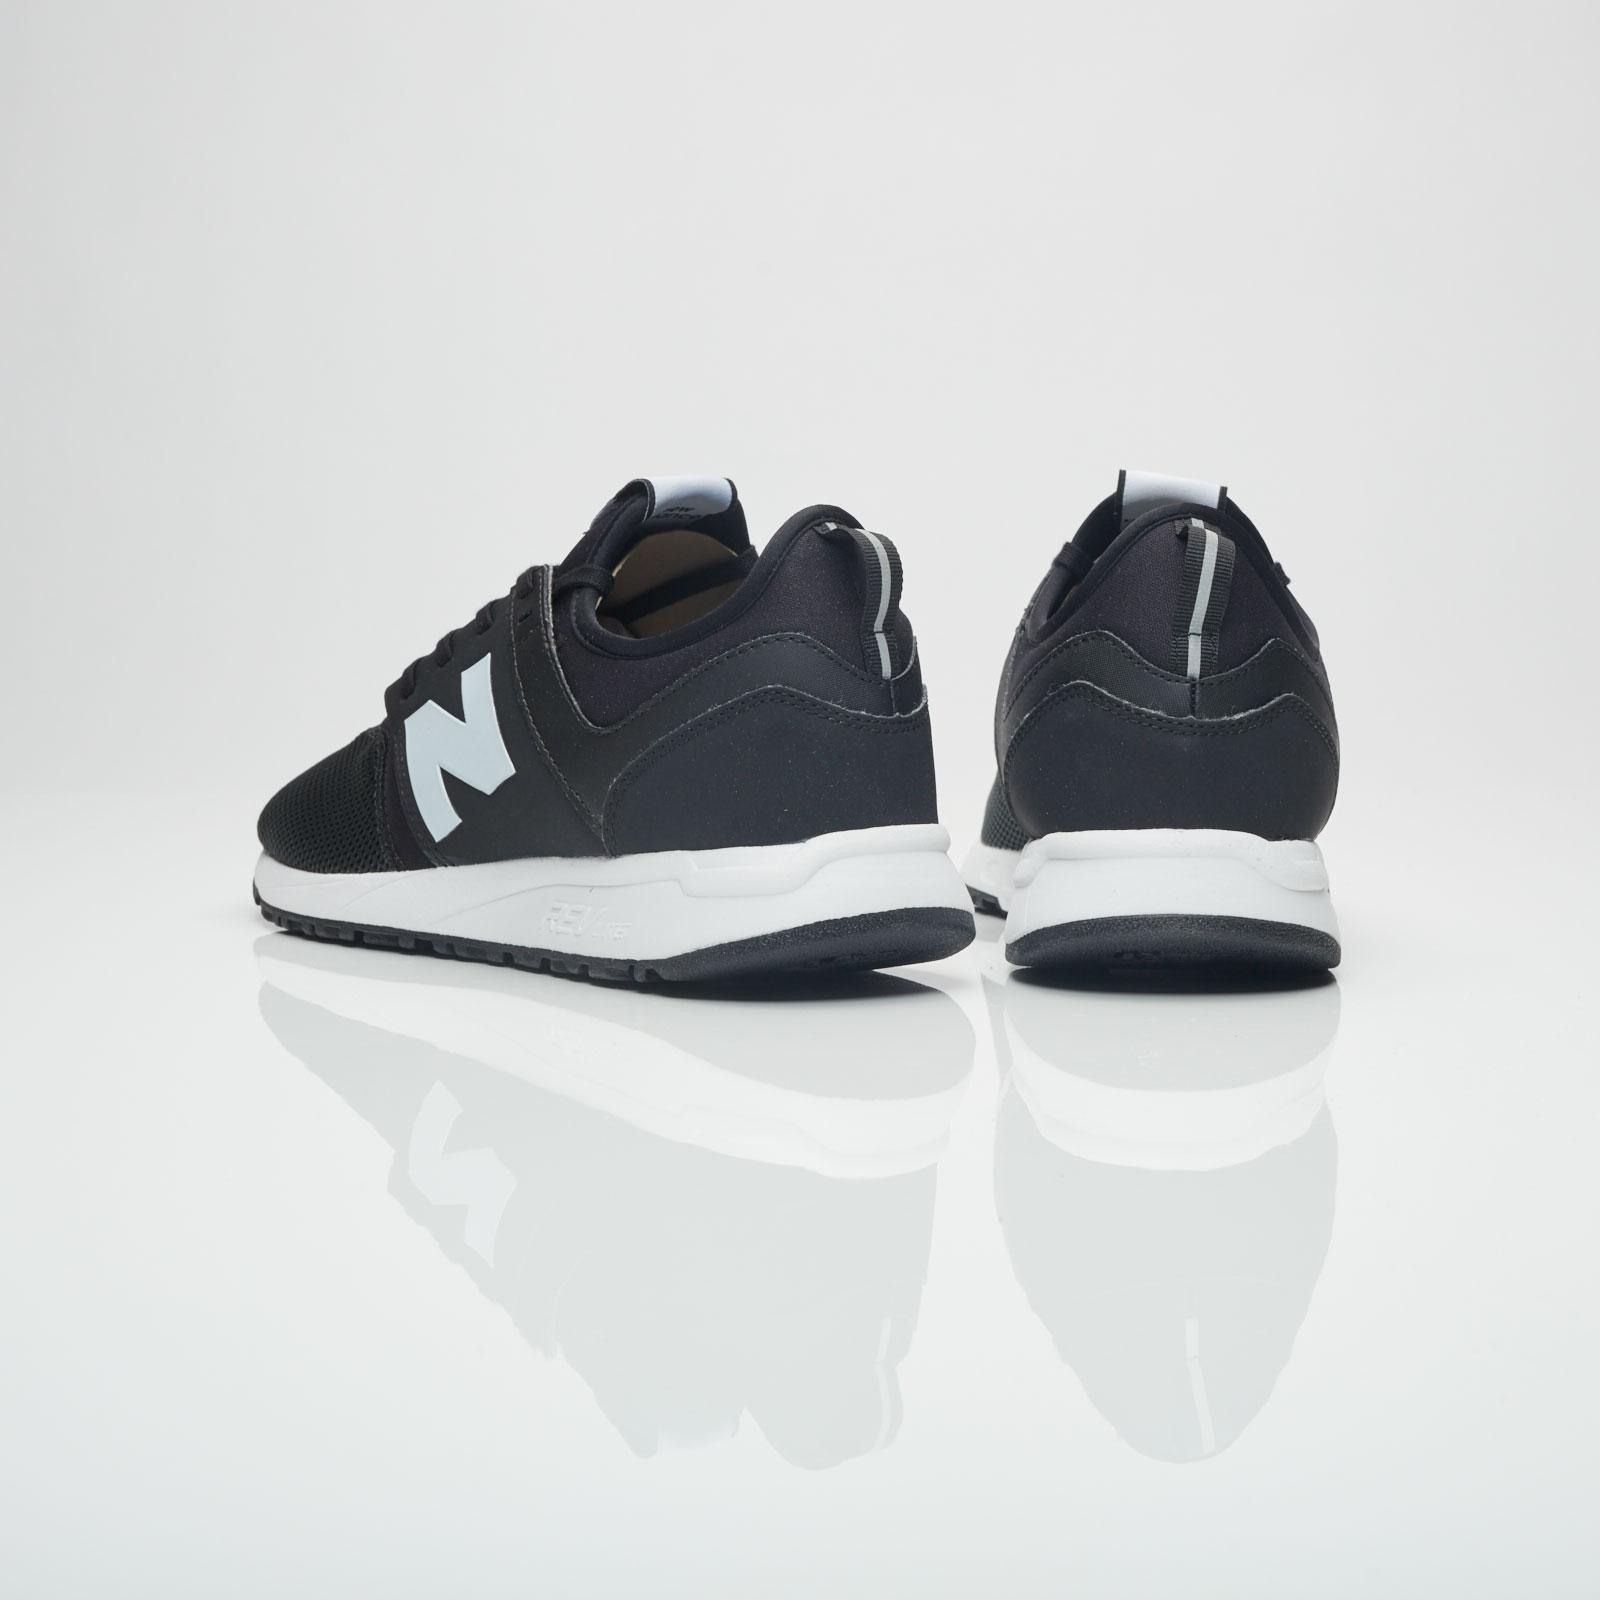 Sneakersnstuff Balance Mrl247bg Sneakers New I Mrl247 kuTOXZPi